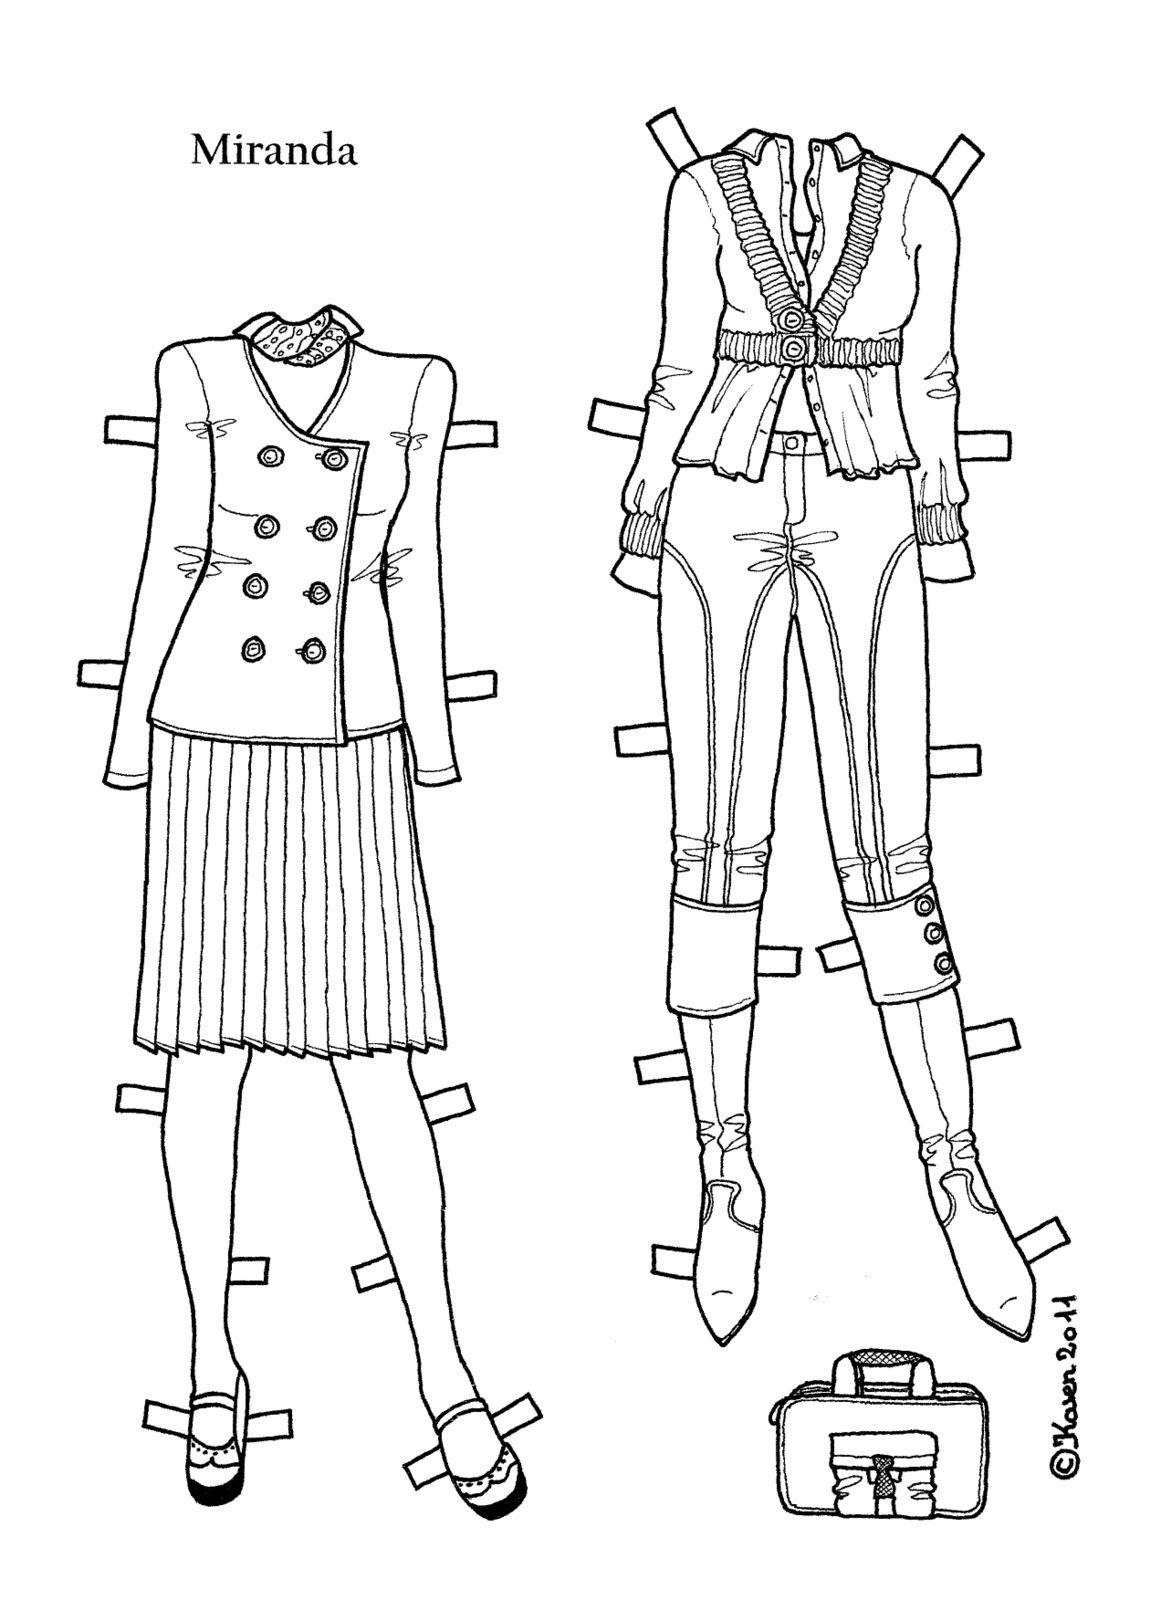 Karen`s Paper Dolls: Miranda                                                                                                                                                                                 More